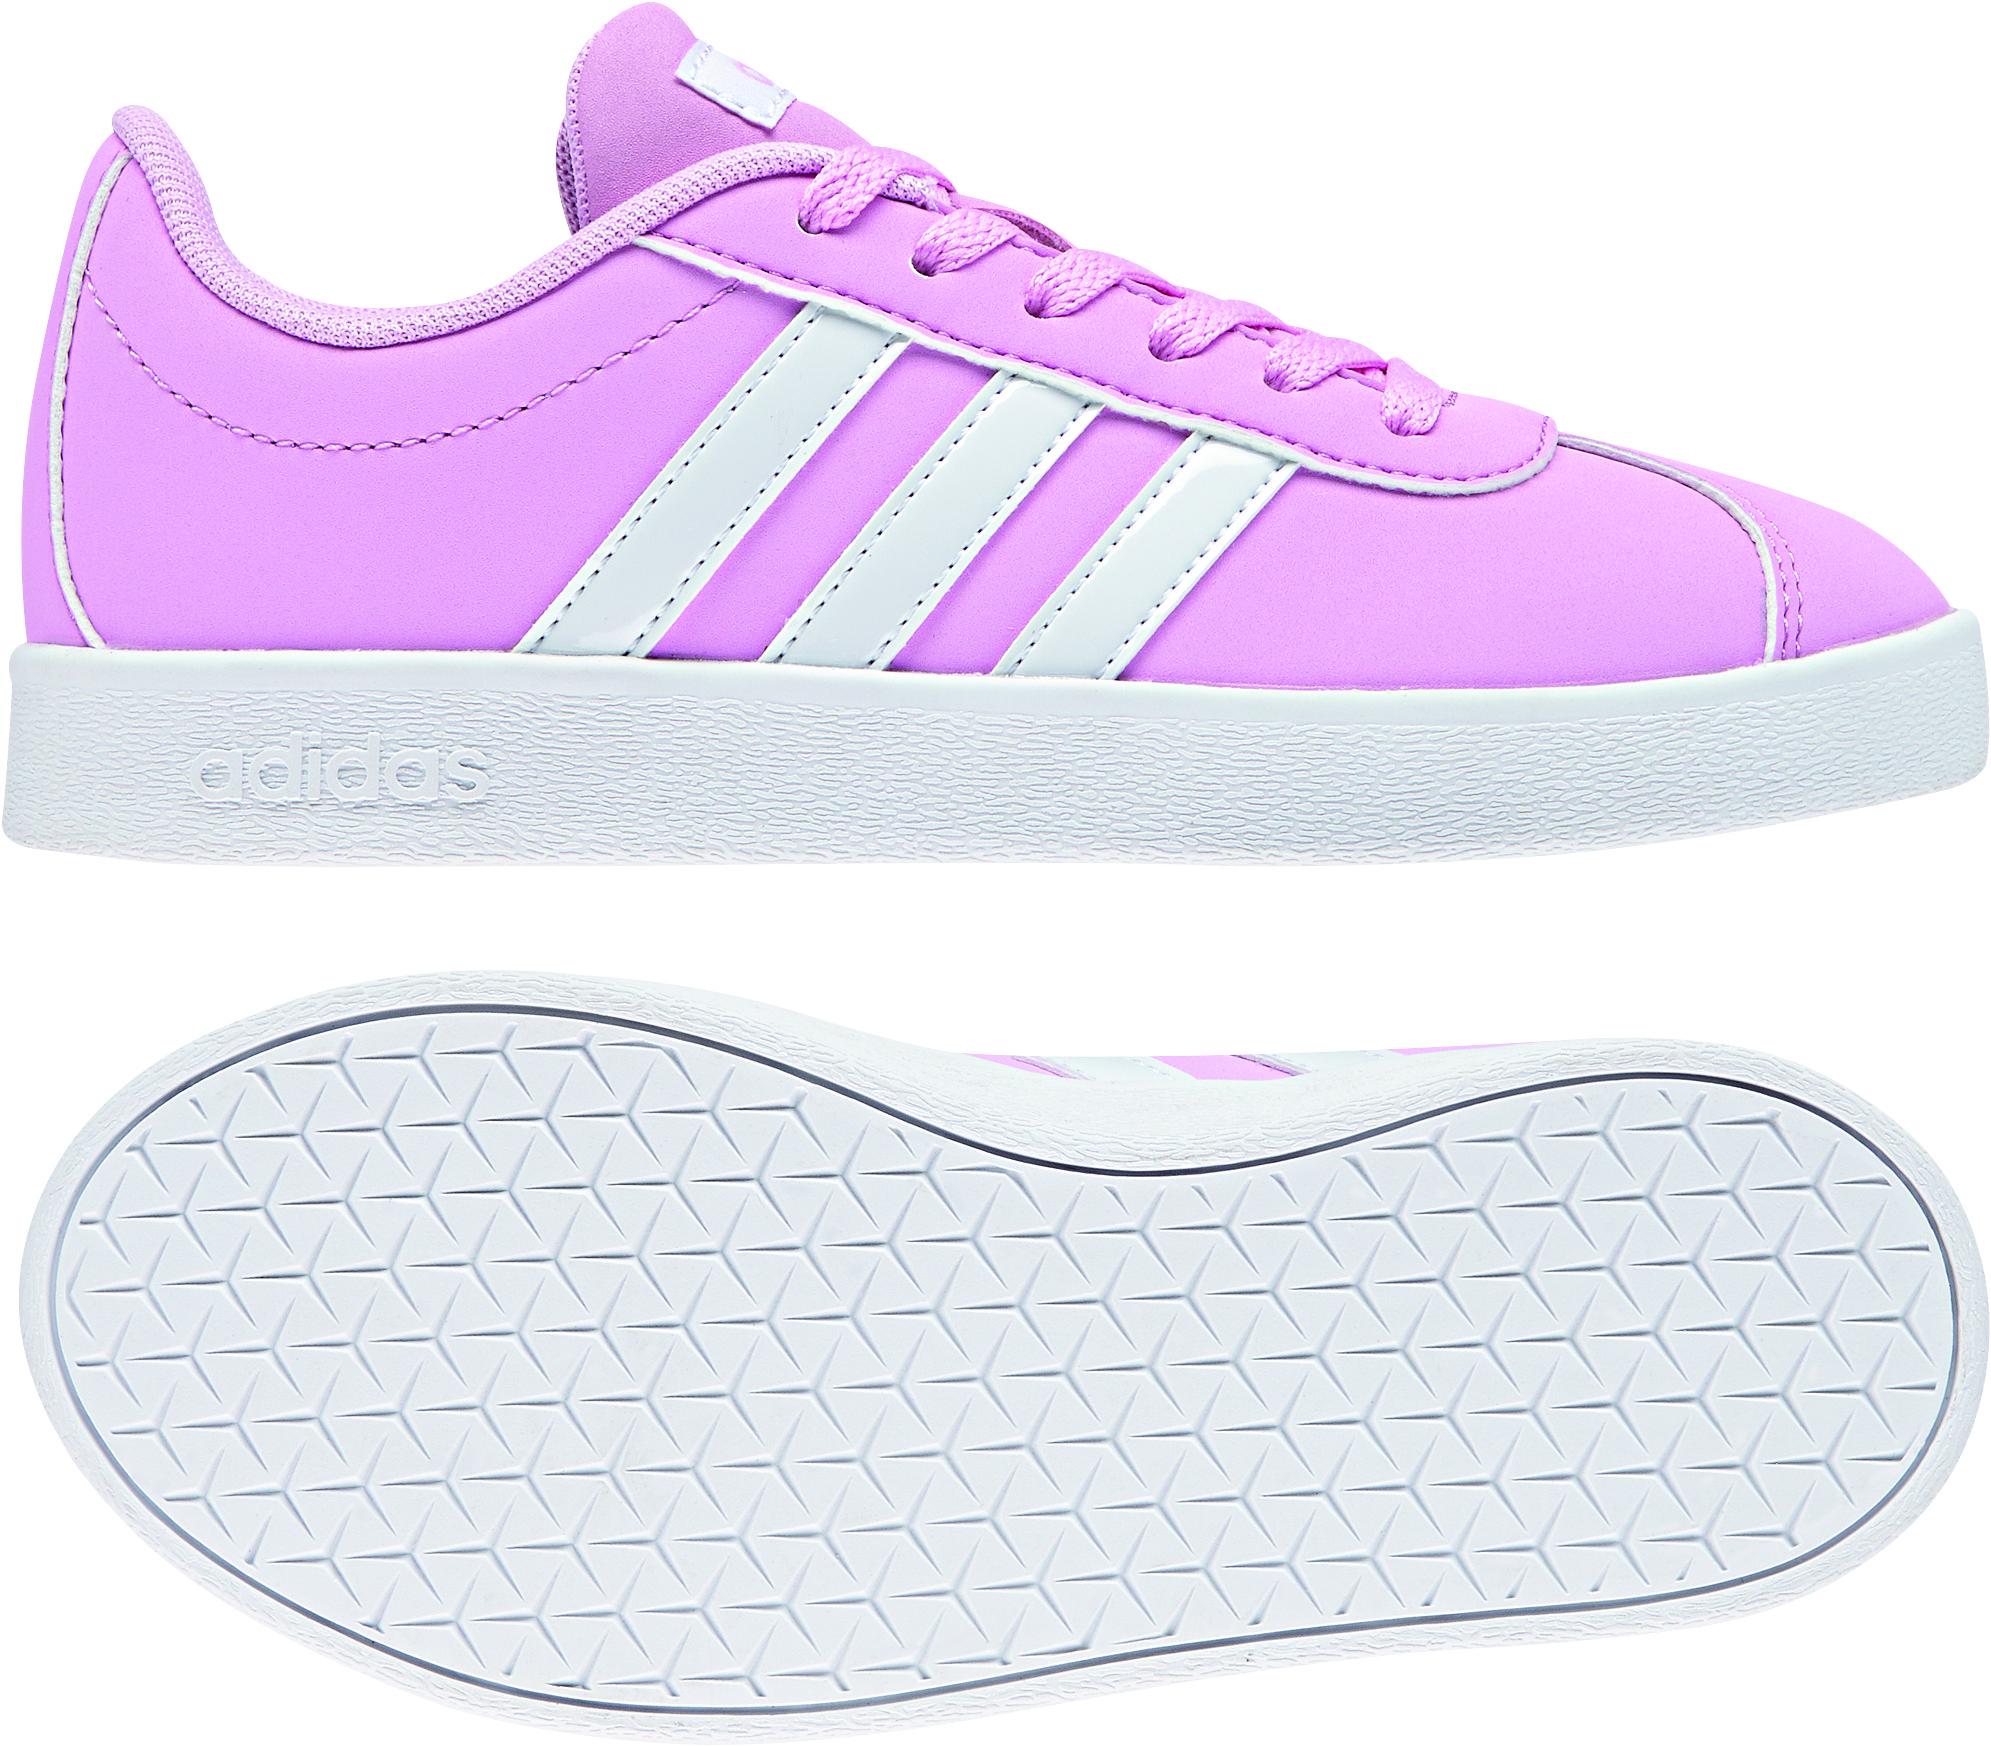 huge selection of 50e5a b6514 Adidas. adidas VL Court 2.0 ...